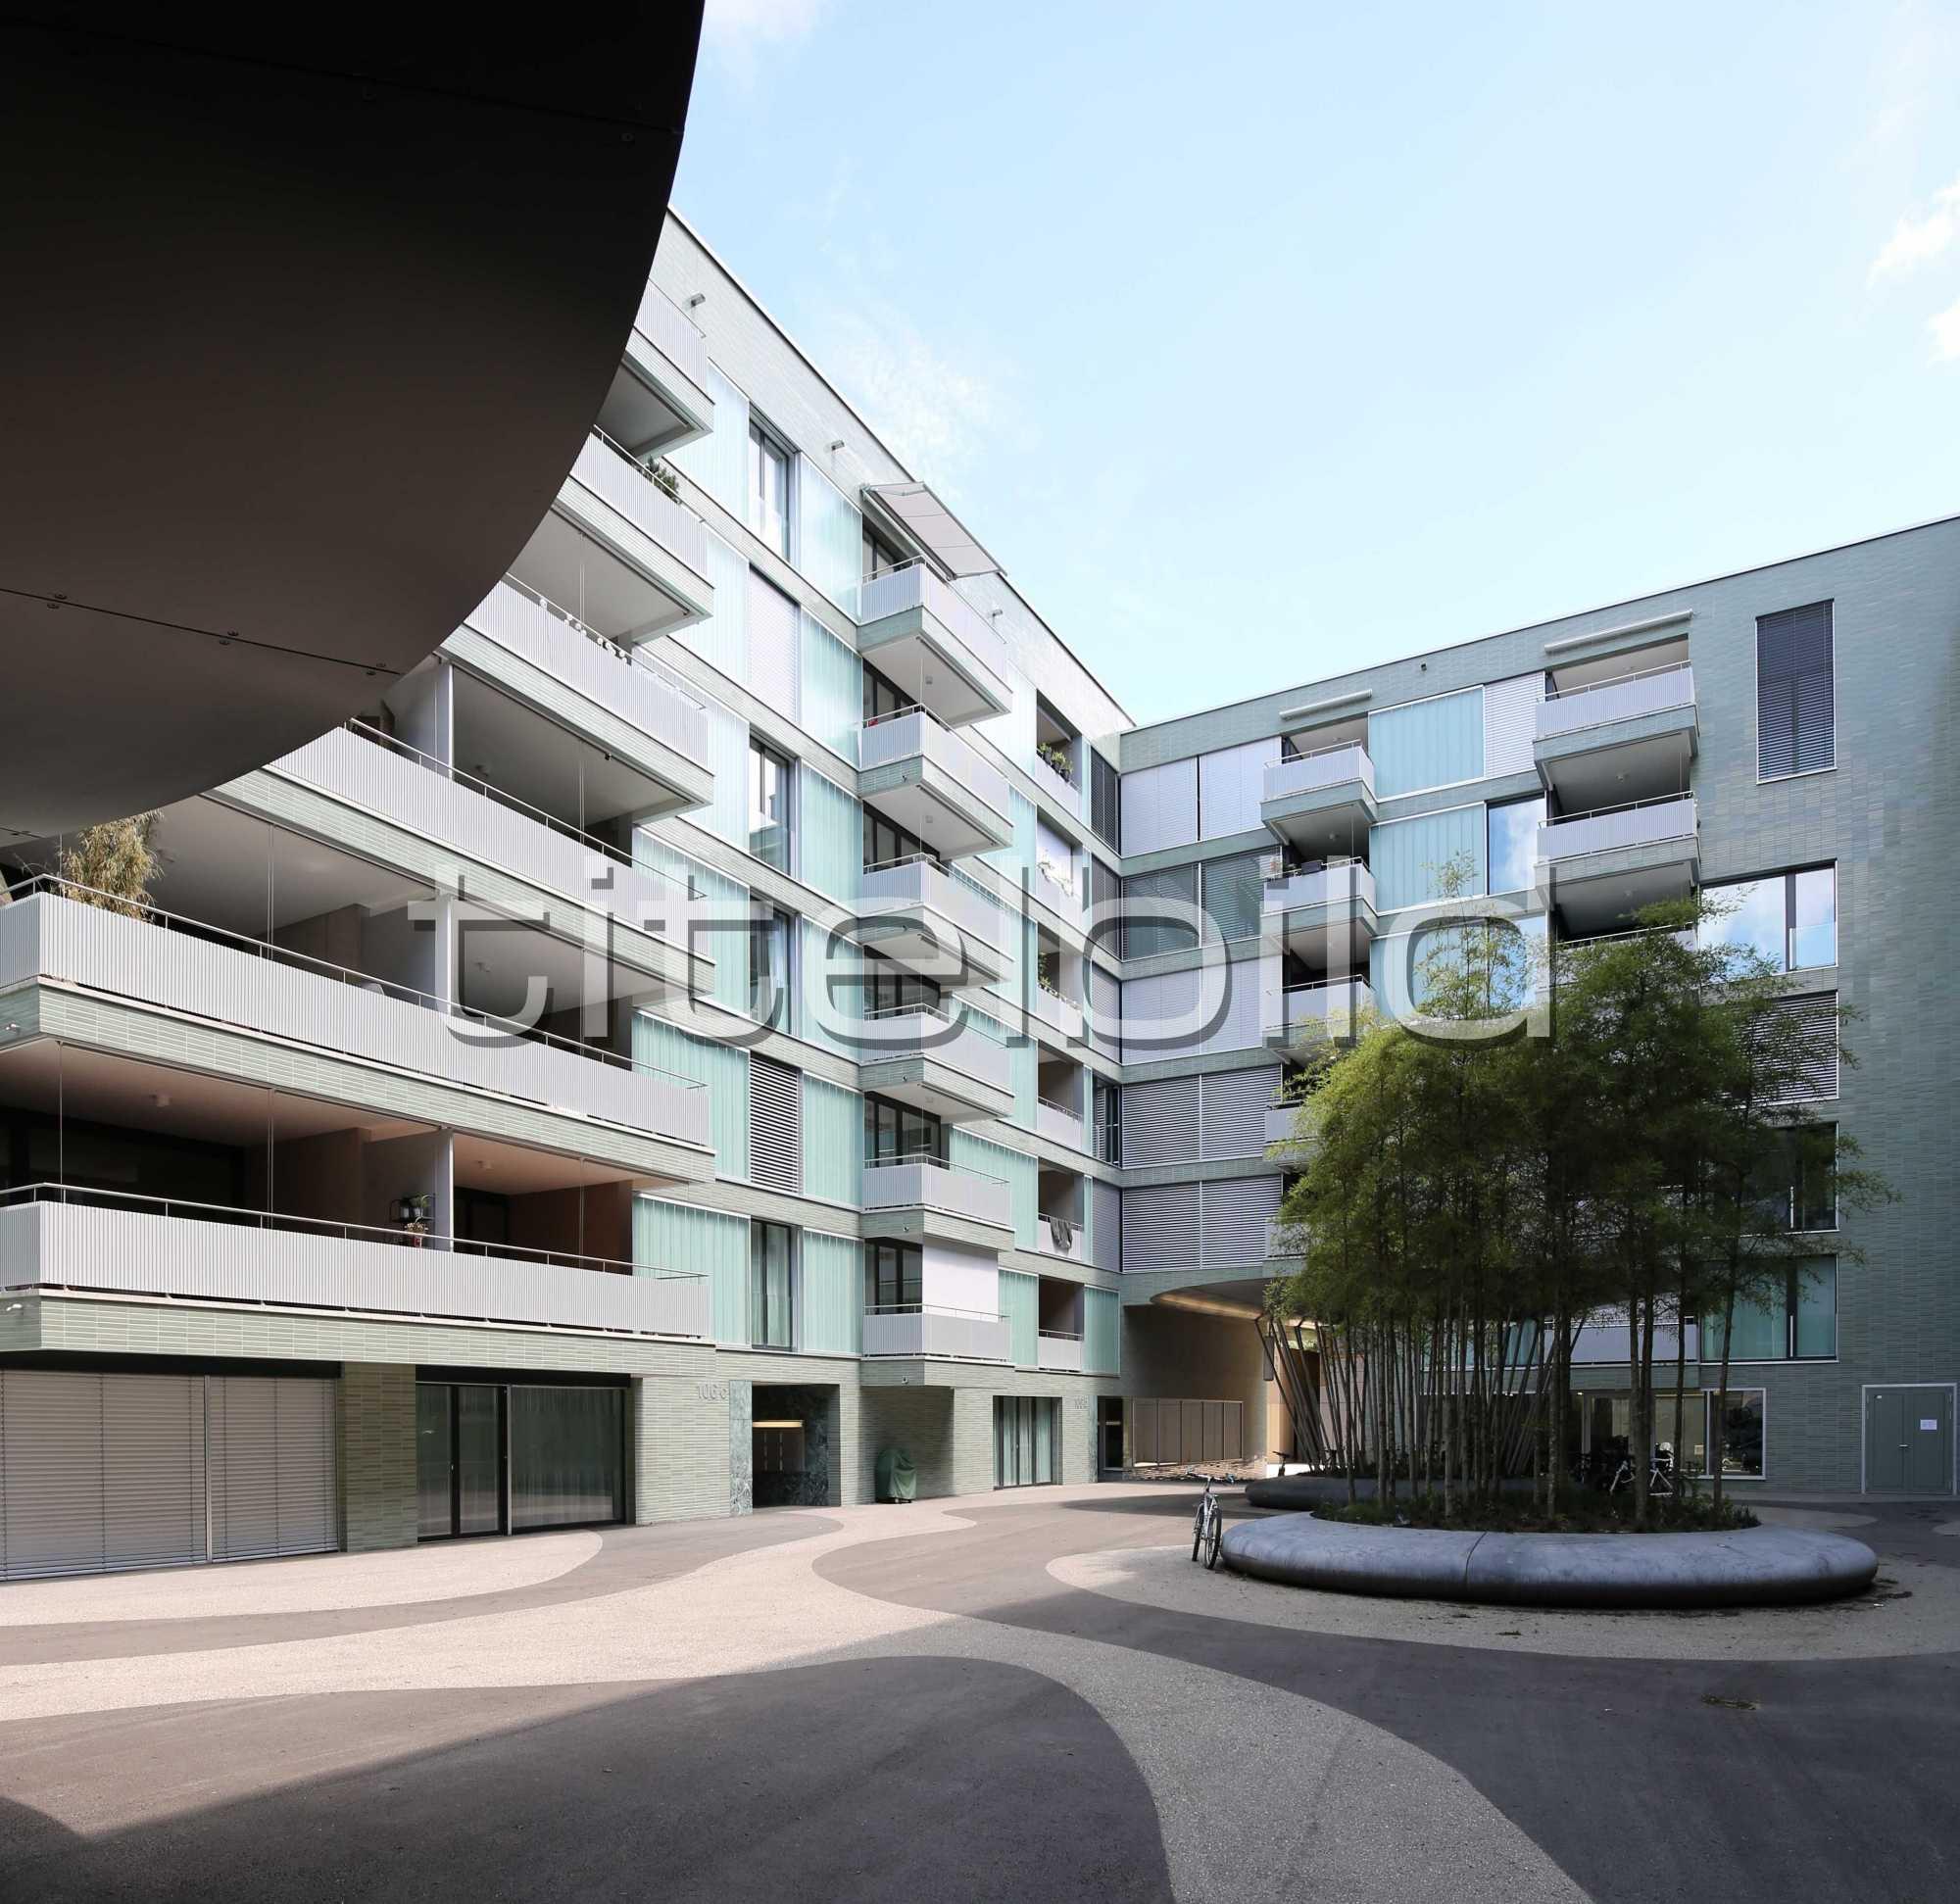 Projektbild-Nr. 6: HardturmPark Baufeld A2 Mietwohnungen